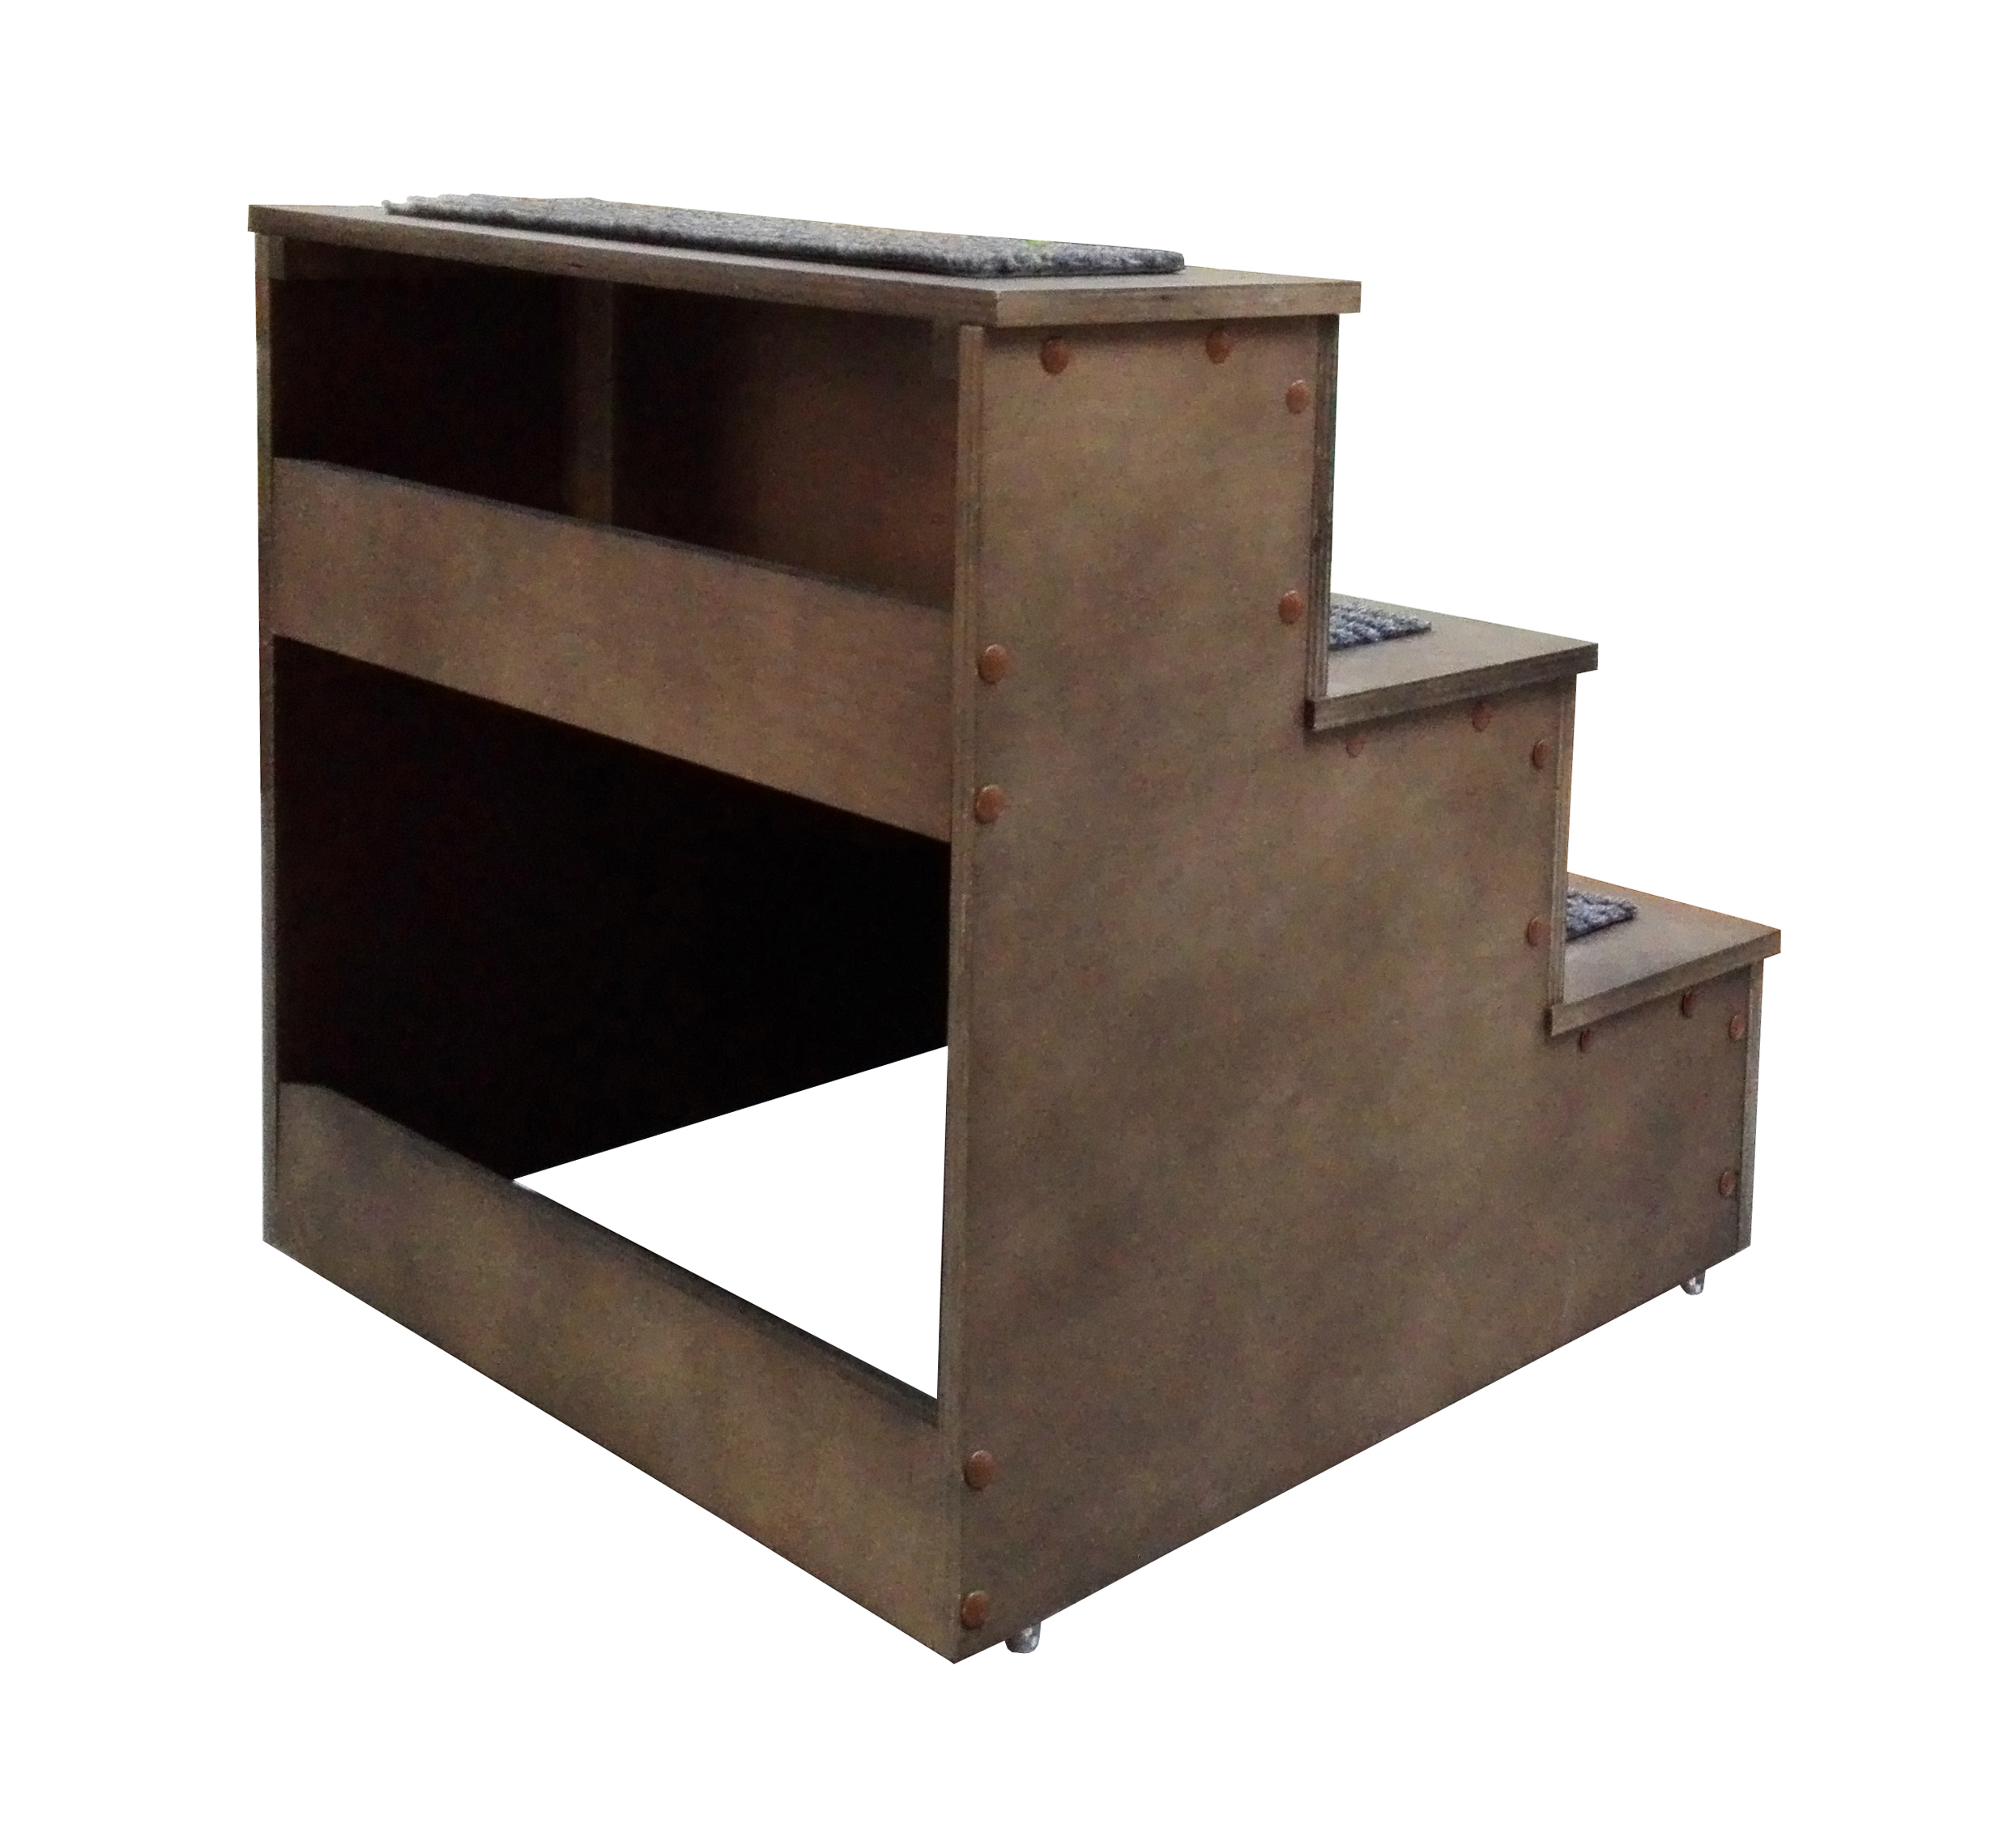 Deluxe Holz Katze Treppen Hund Stufenleiter Haustier 3 ...